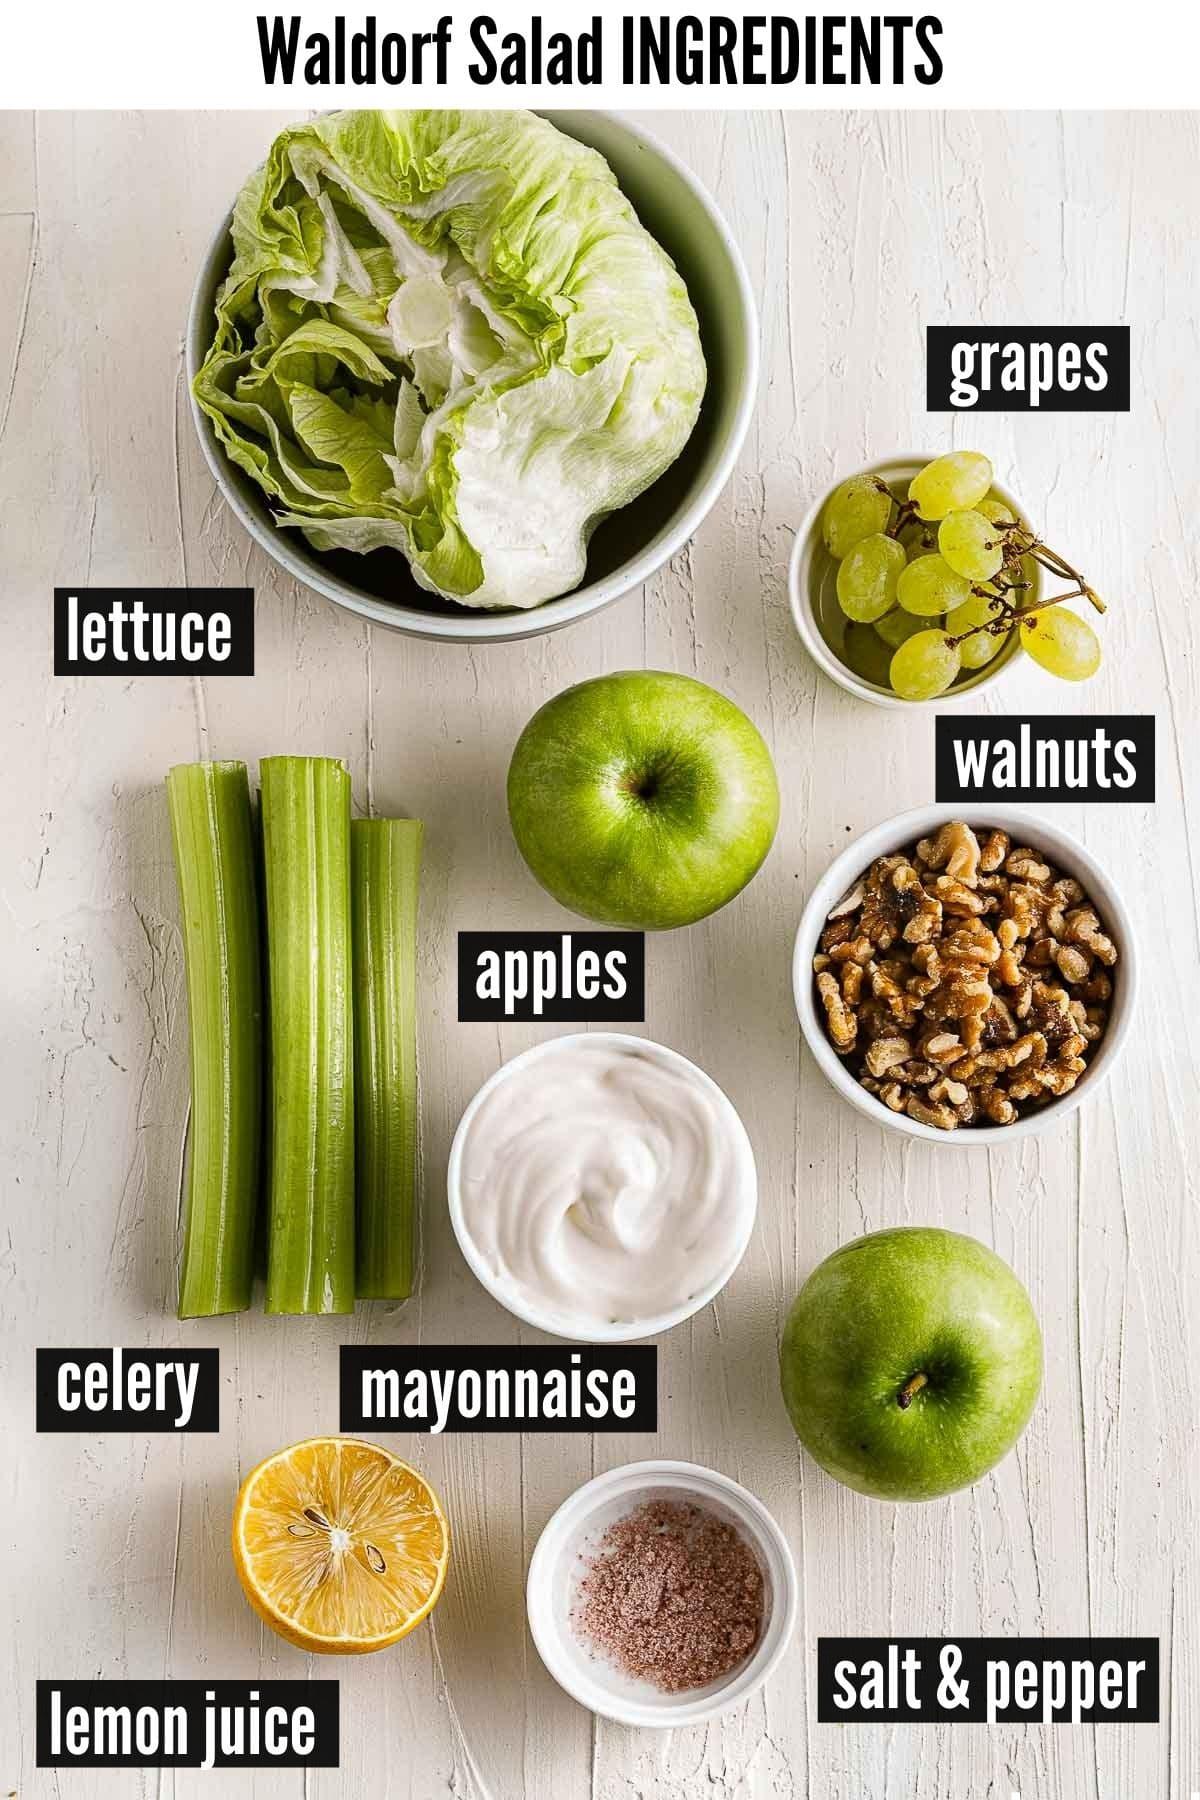 waldorf salad ingredients image